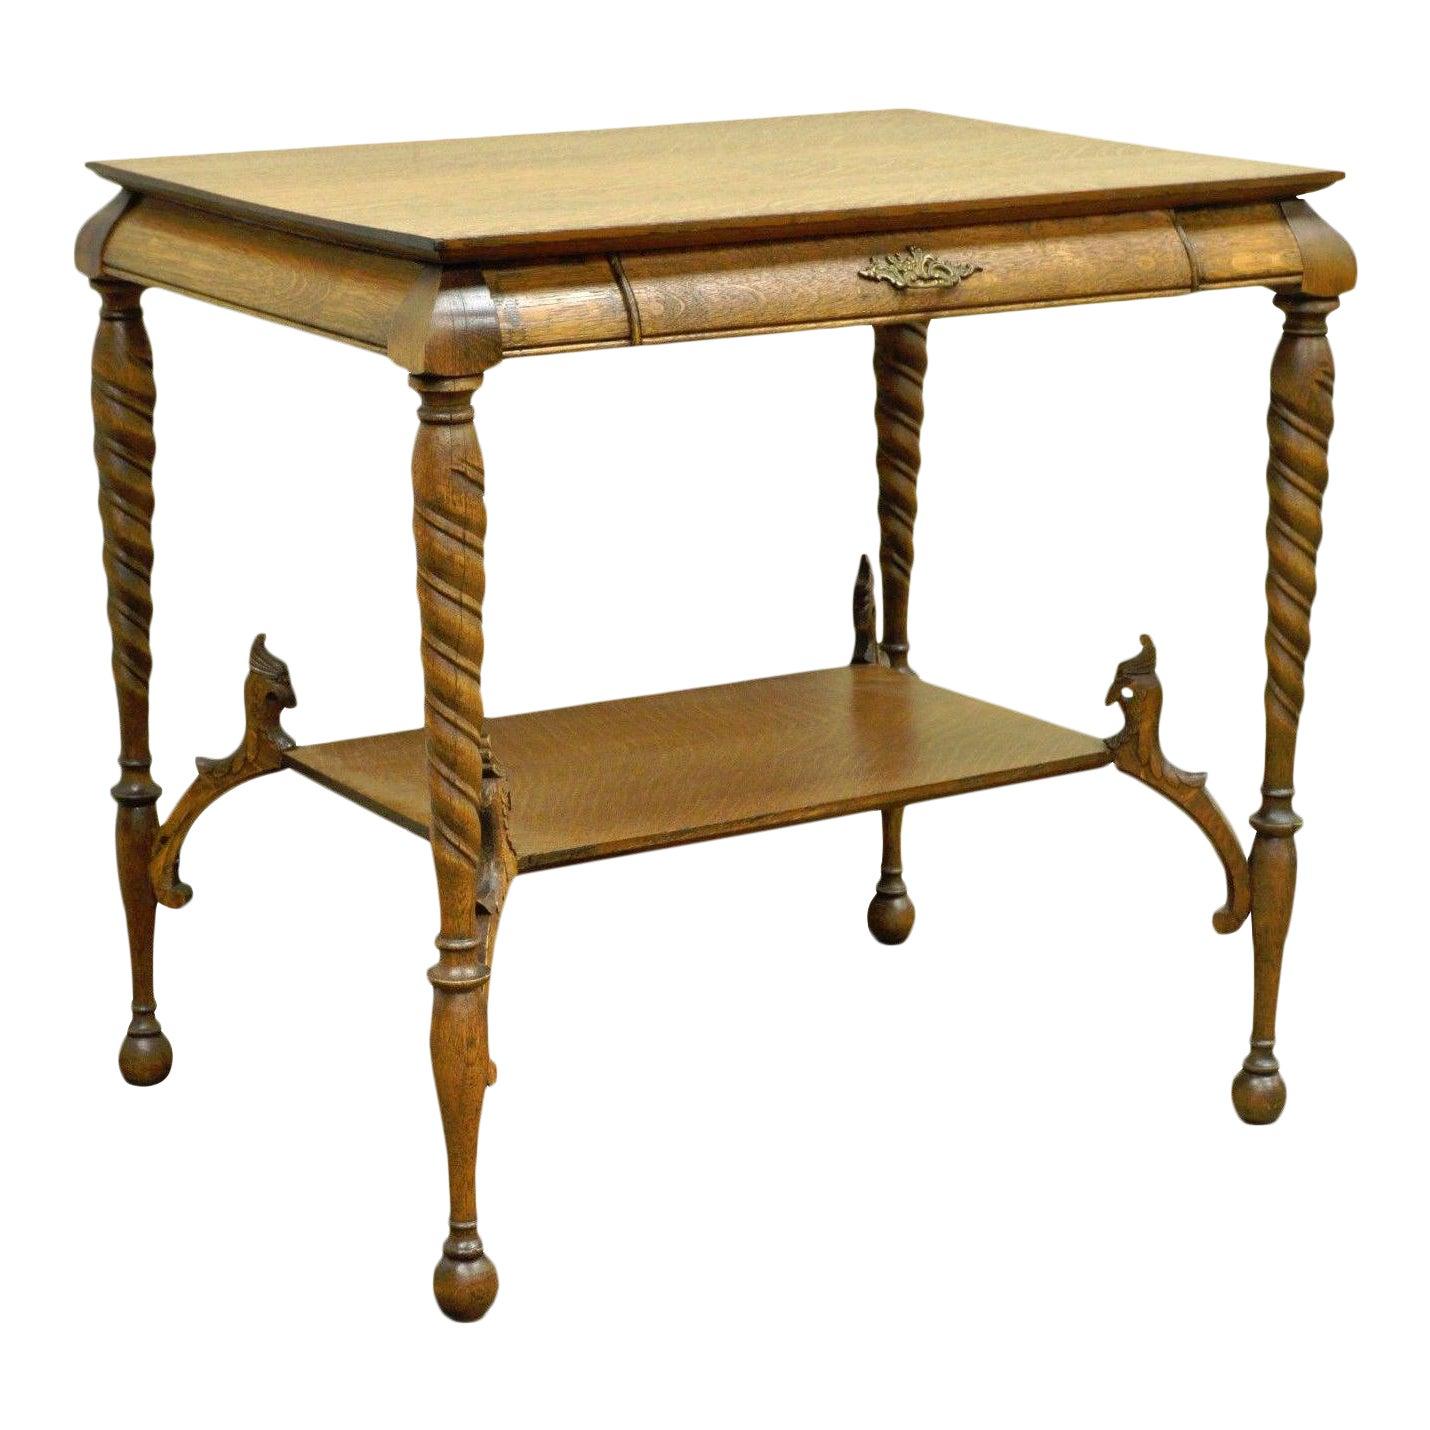 Antique Victorian Oak Barley Twist Figural Ladies Writing Desk Hall Table  Vintage   Chairish - Antique Victorian Oak Barley Twist Figural Ladies Writing Desk Hall